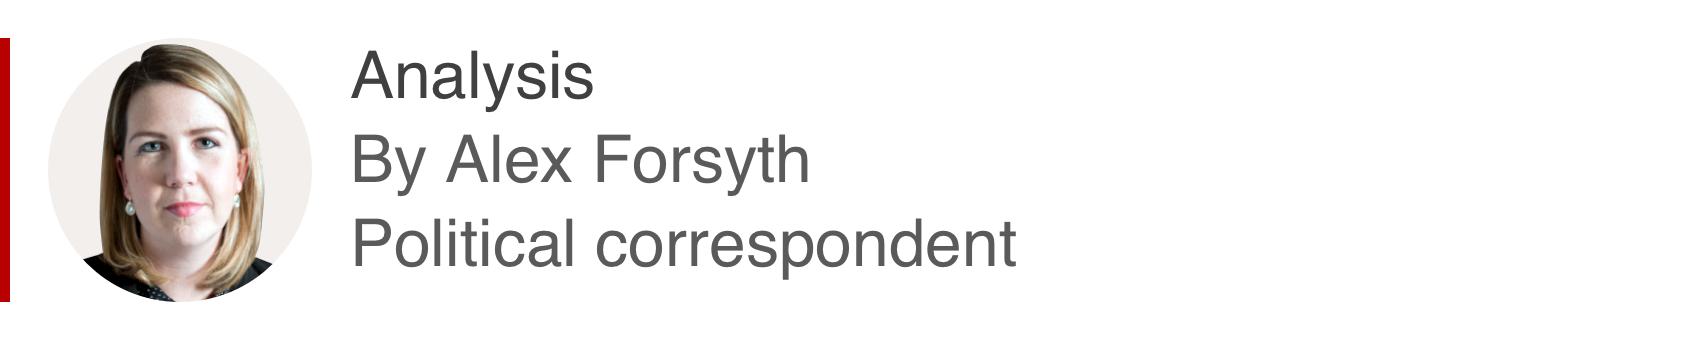 Analysis by Alex Forsyth, political correspondent